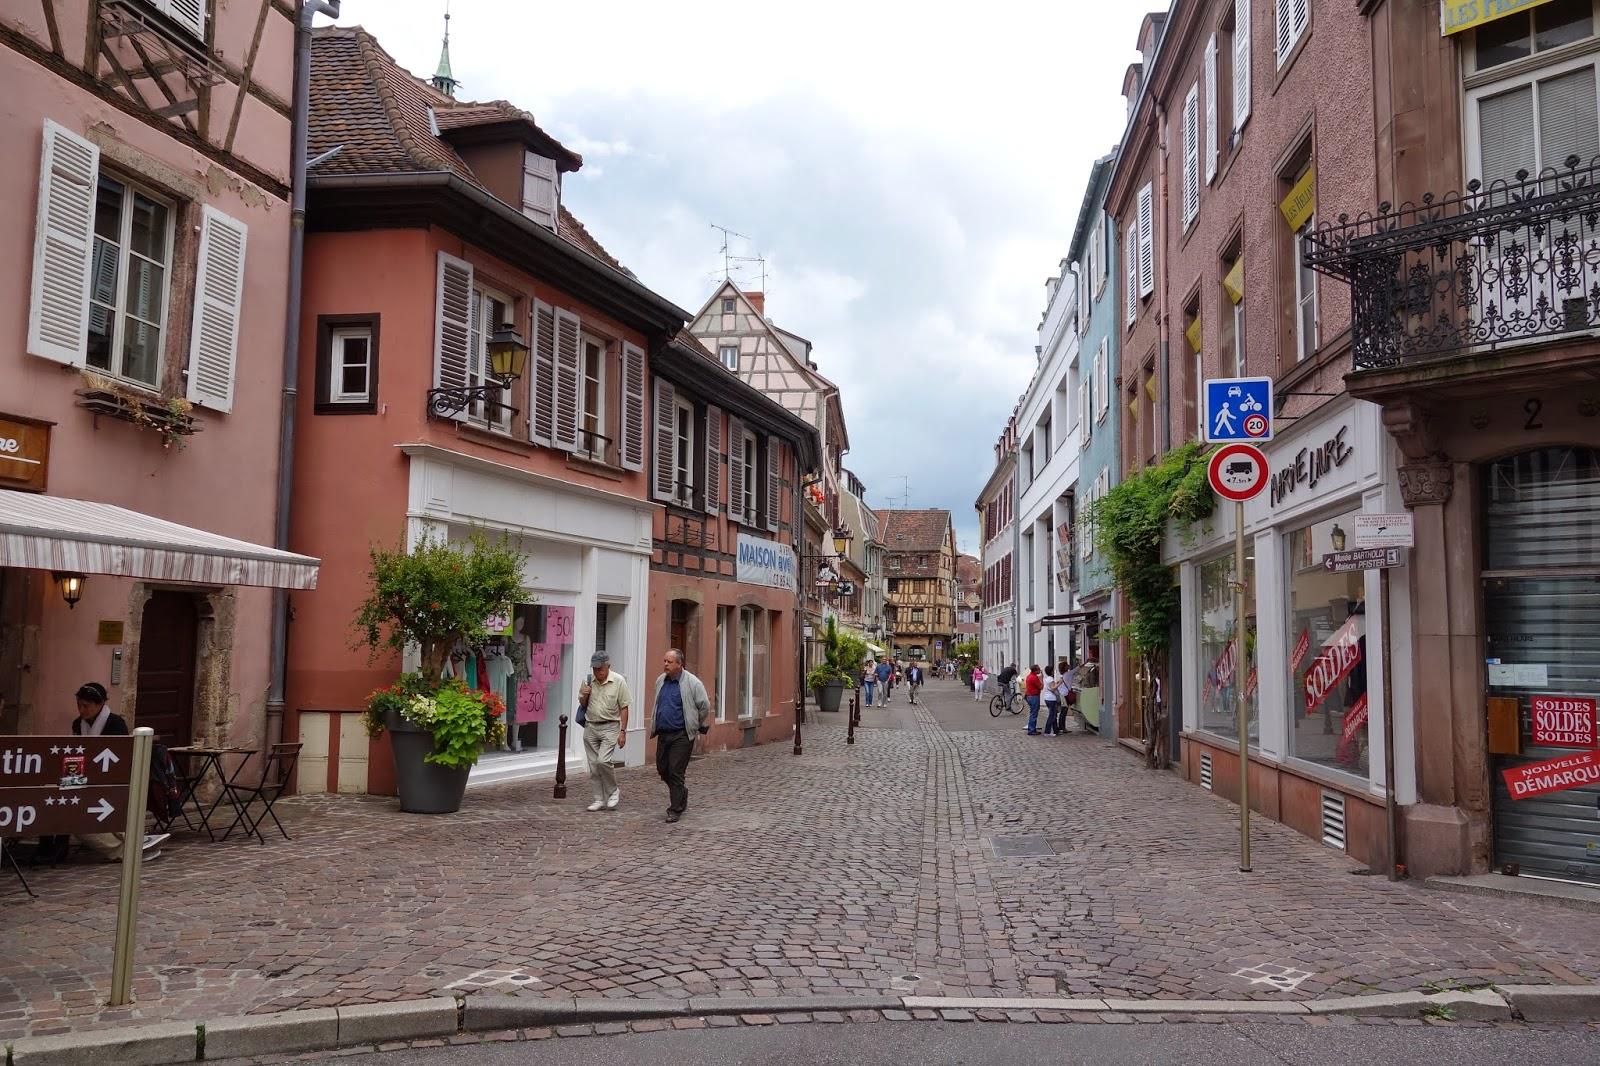 Улица Торговцев - начало